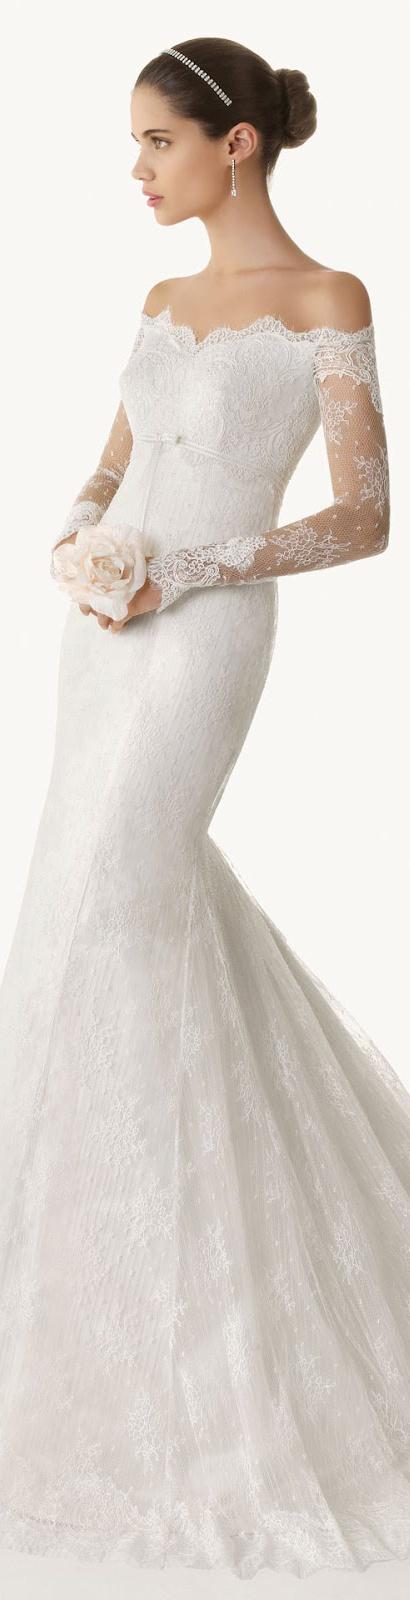 Xscape Wedding Dresses - Wedding Dress & Decore Ideas